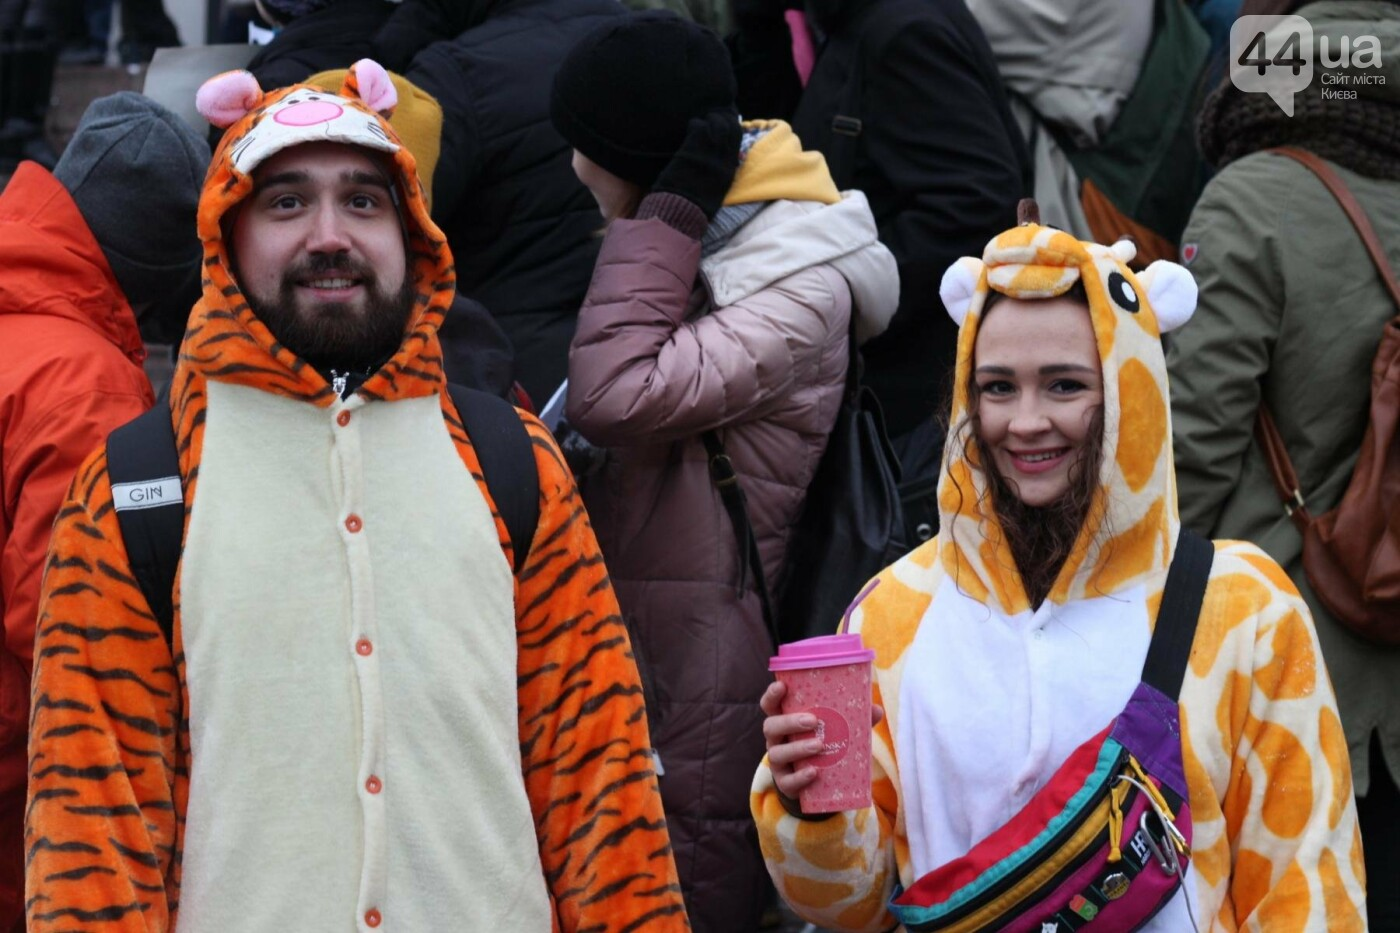 Цирк без животных: как в Киеве прошла акция протеста, фото-36